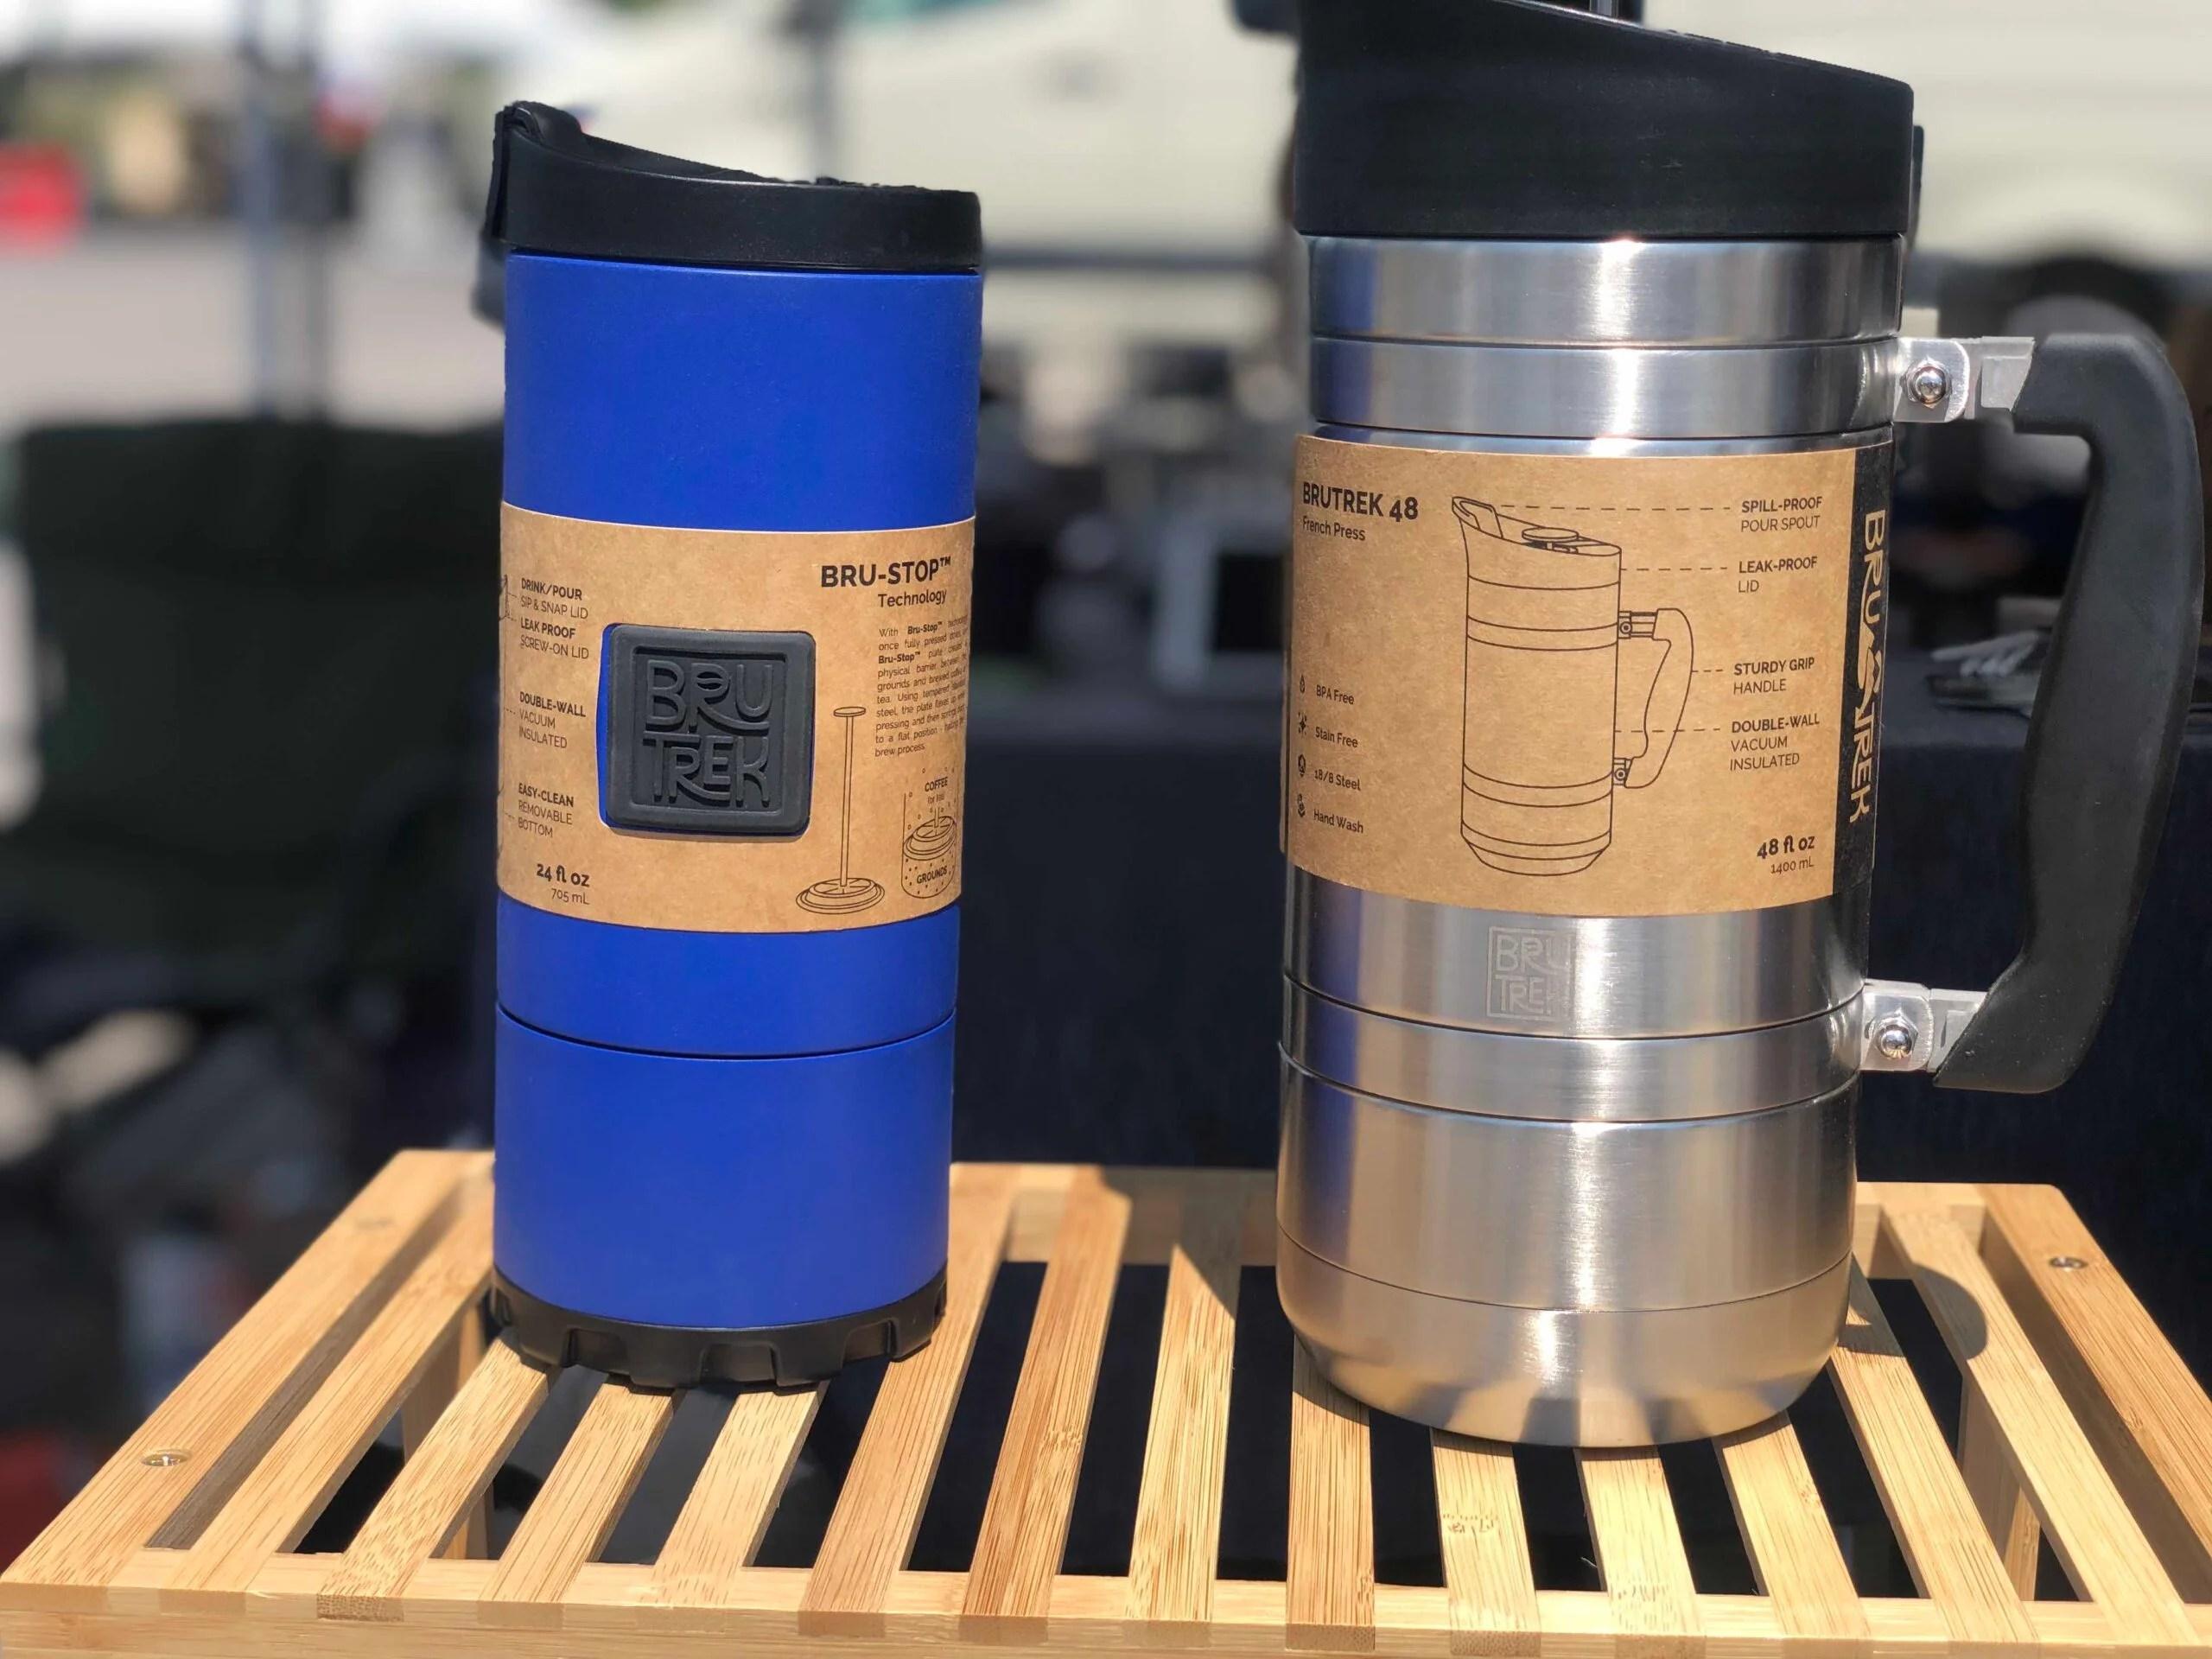 Two coffee mugs on display